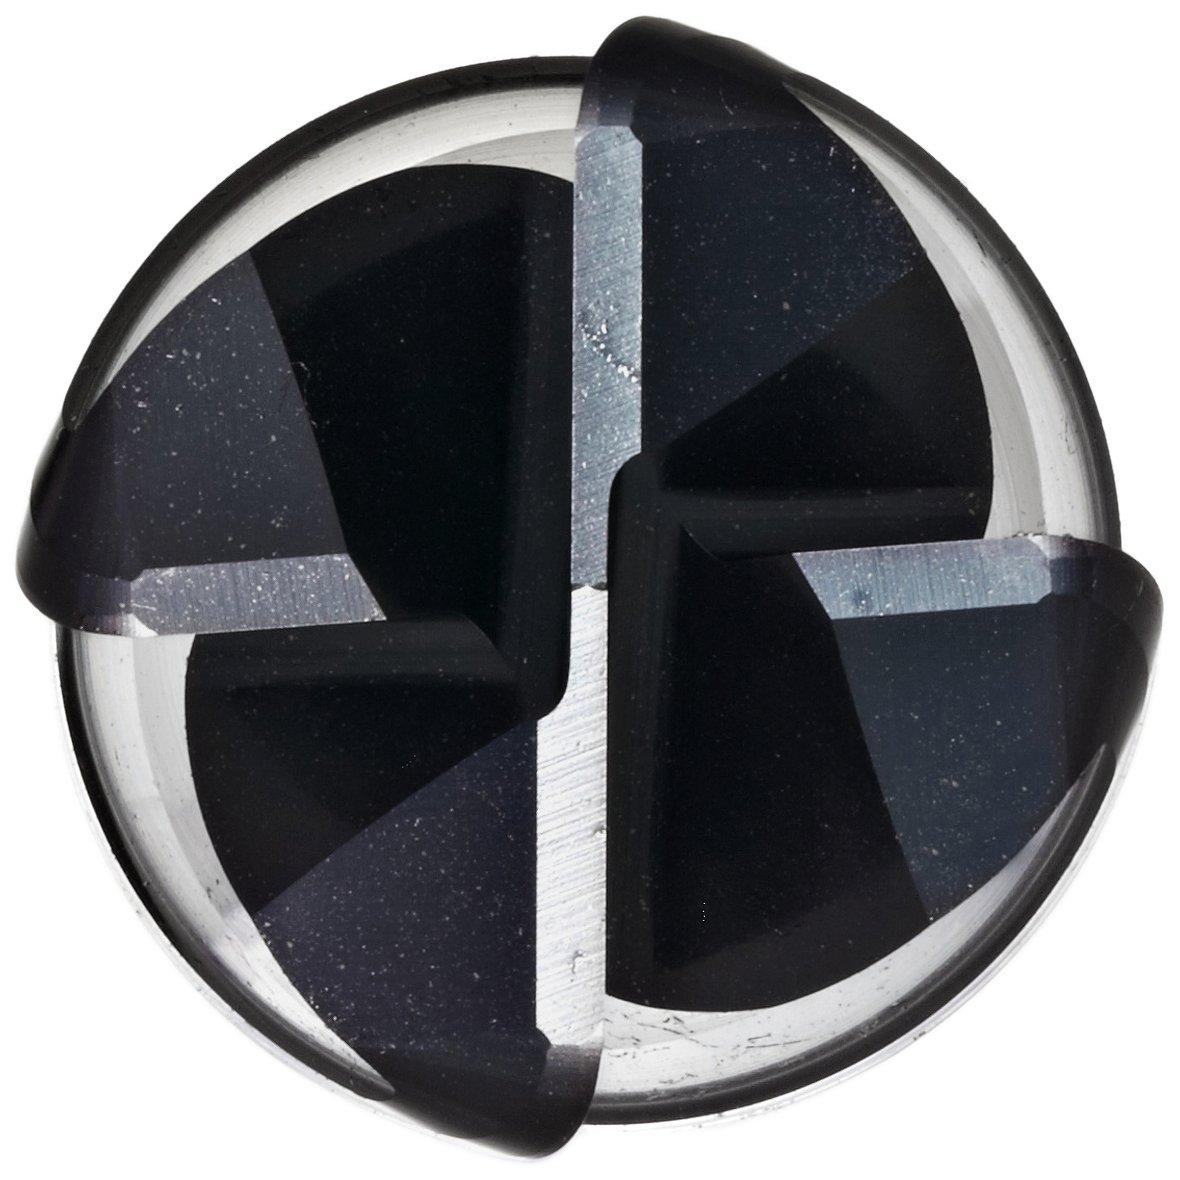 0.4375 Shank Diameter Guhring 3876 RF 100 Ti Carbide Corner Radius End Mill 4 Flutes Finishing Cut Vibration Resistant 0.4375 Cutting Diameter 2.75 Overall Length 35 Deg Helix AlTiN Monolayer Finish 0.031 Corner Radius